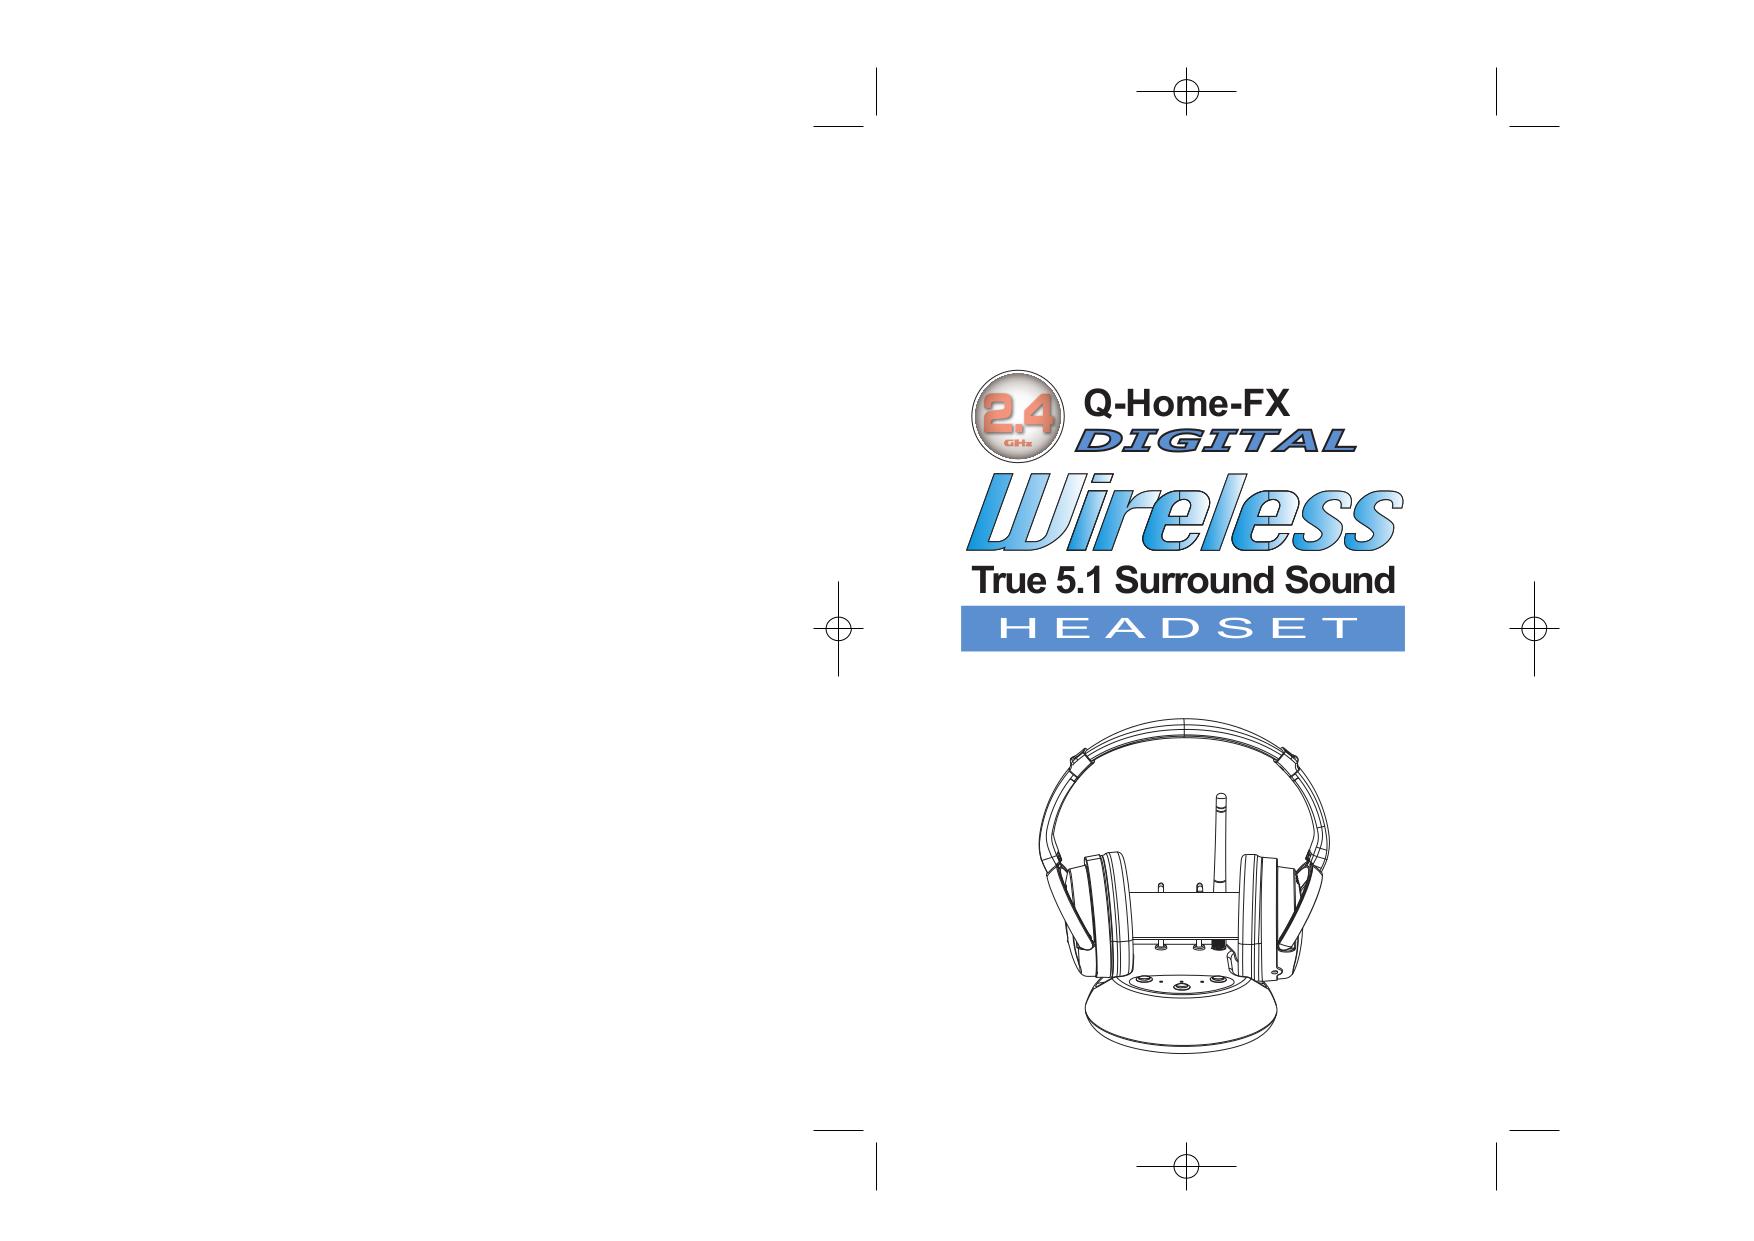 pdf for LTB Headphone Q-Home-FX manual